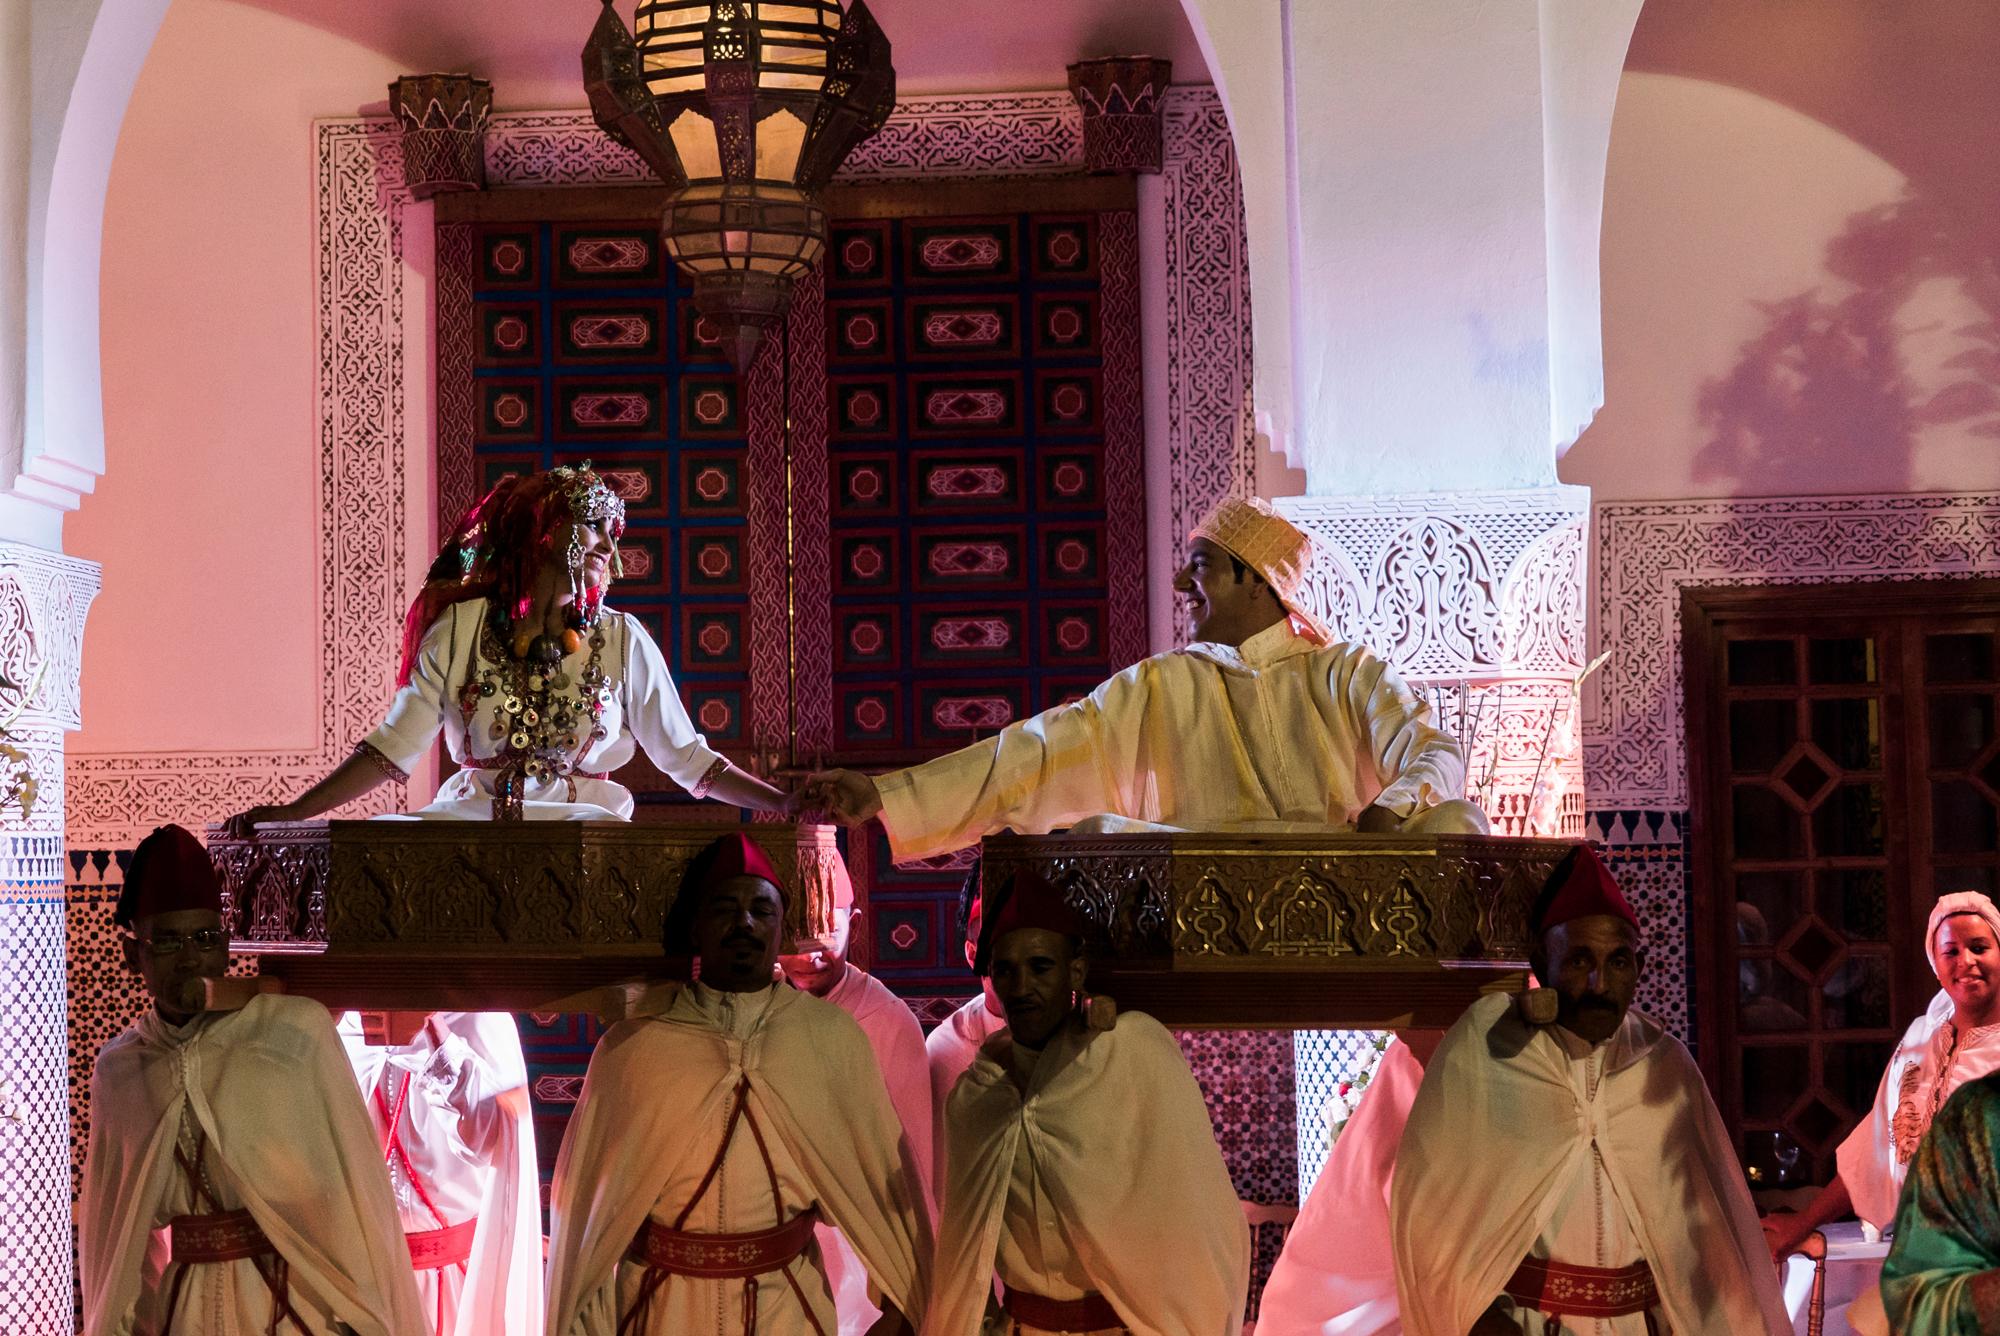 marrakech-morocco-destination-wedding-lilouette-46.jpg